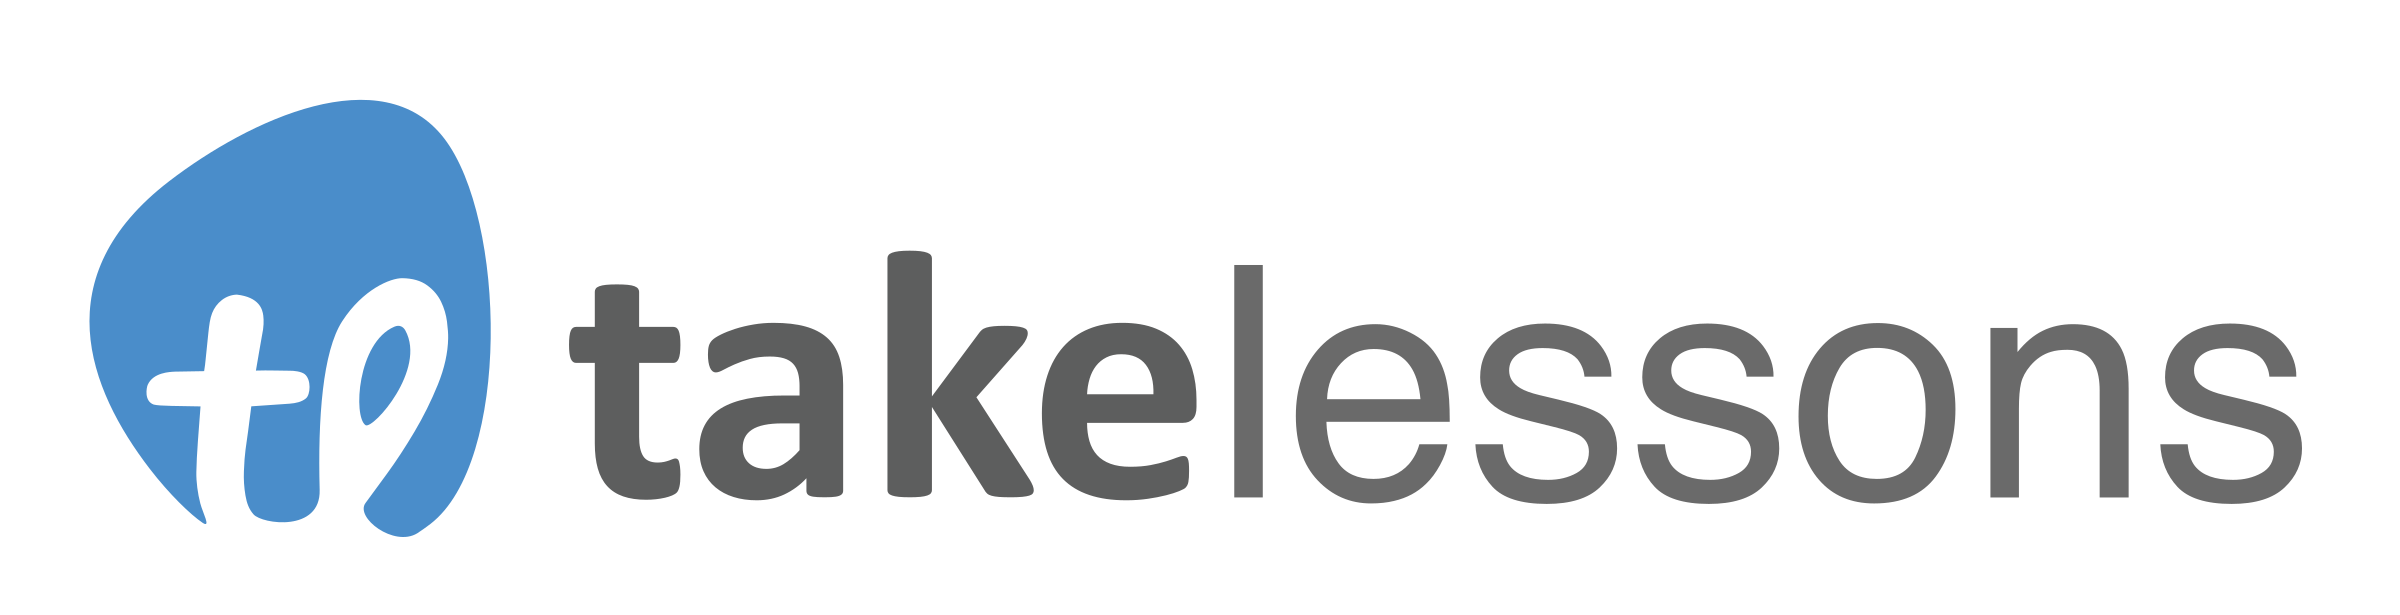 take-lessons-logo-png-transparent.png